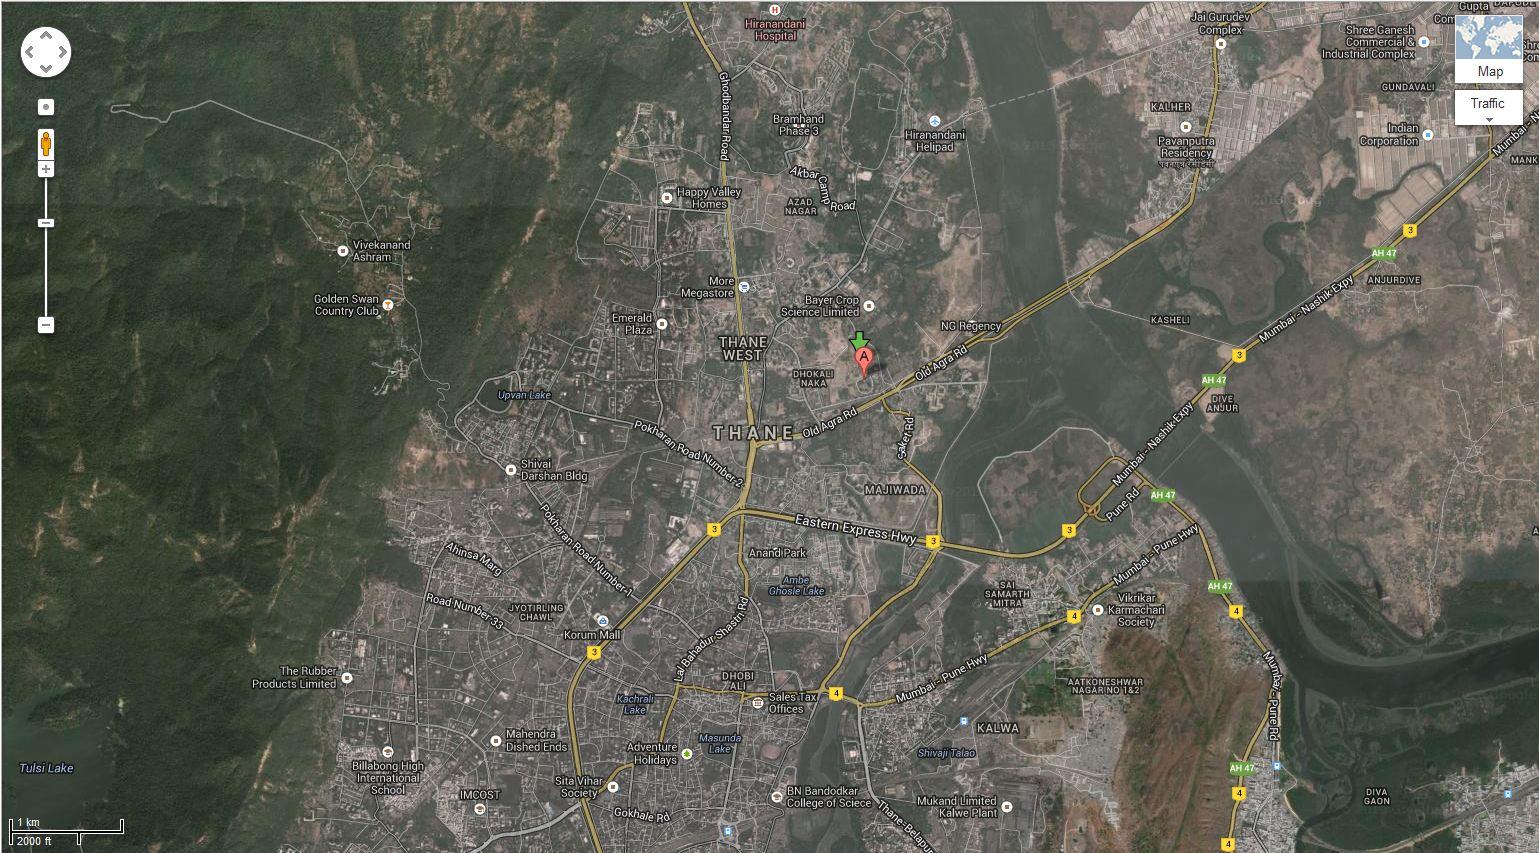 Runwal Eirene Debuts in Thane @7398/- PSF